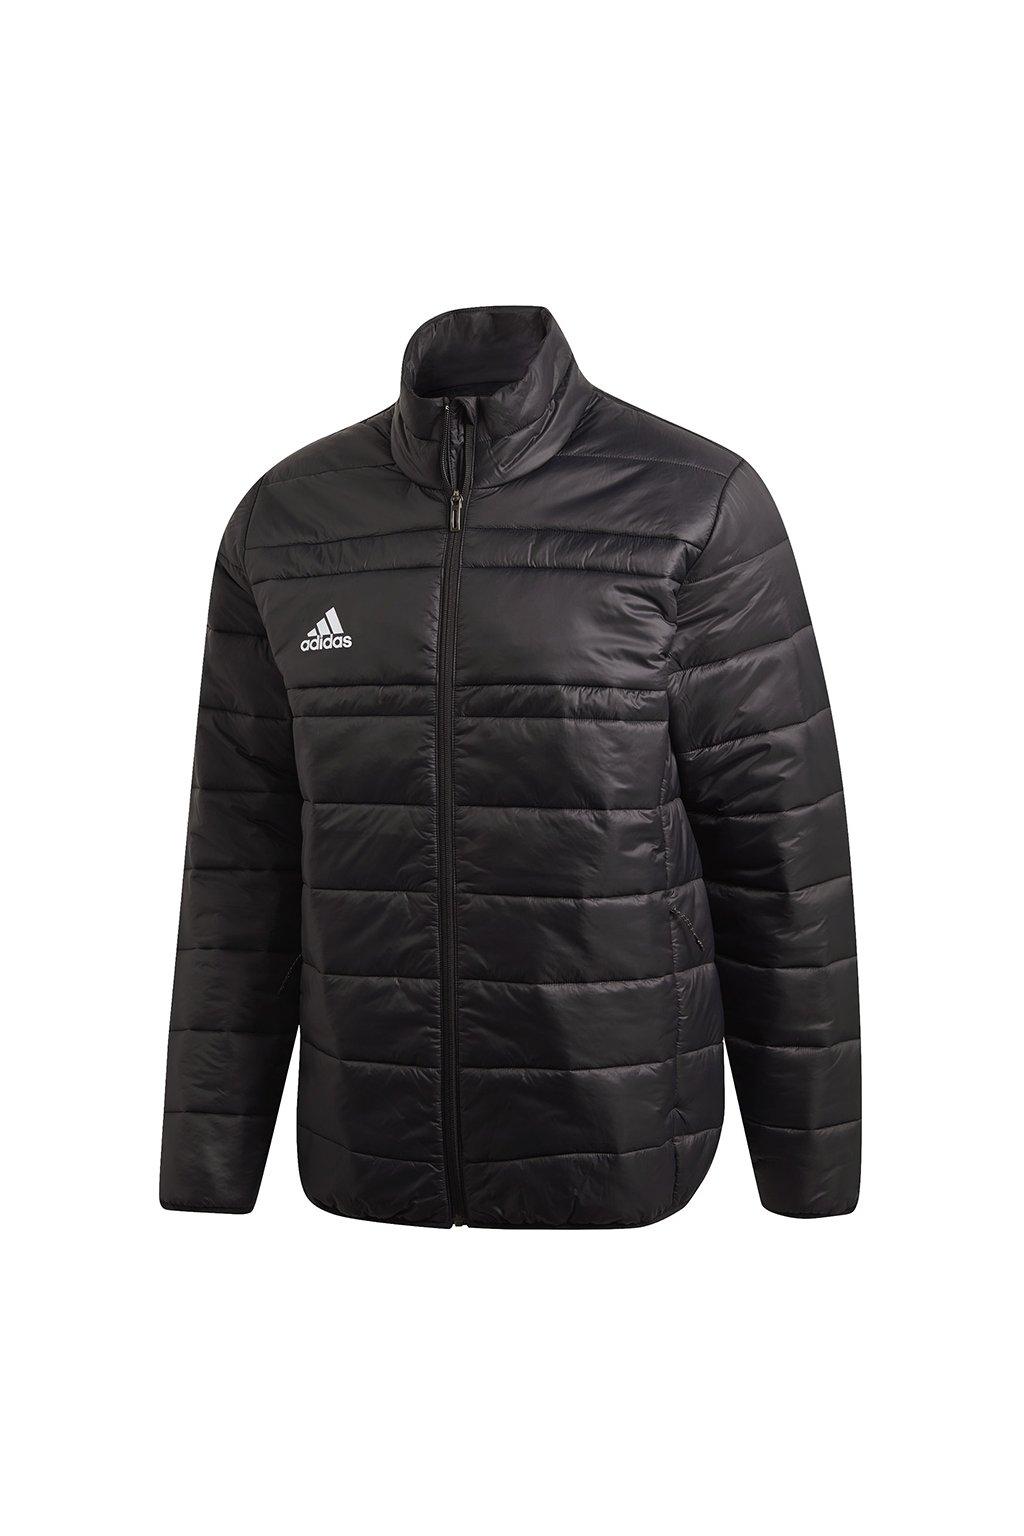 Pánska bunda adidas Light Padding Jacket 18 čierna FT8073